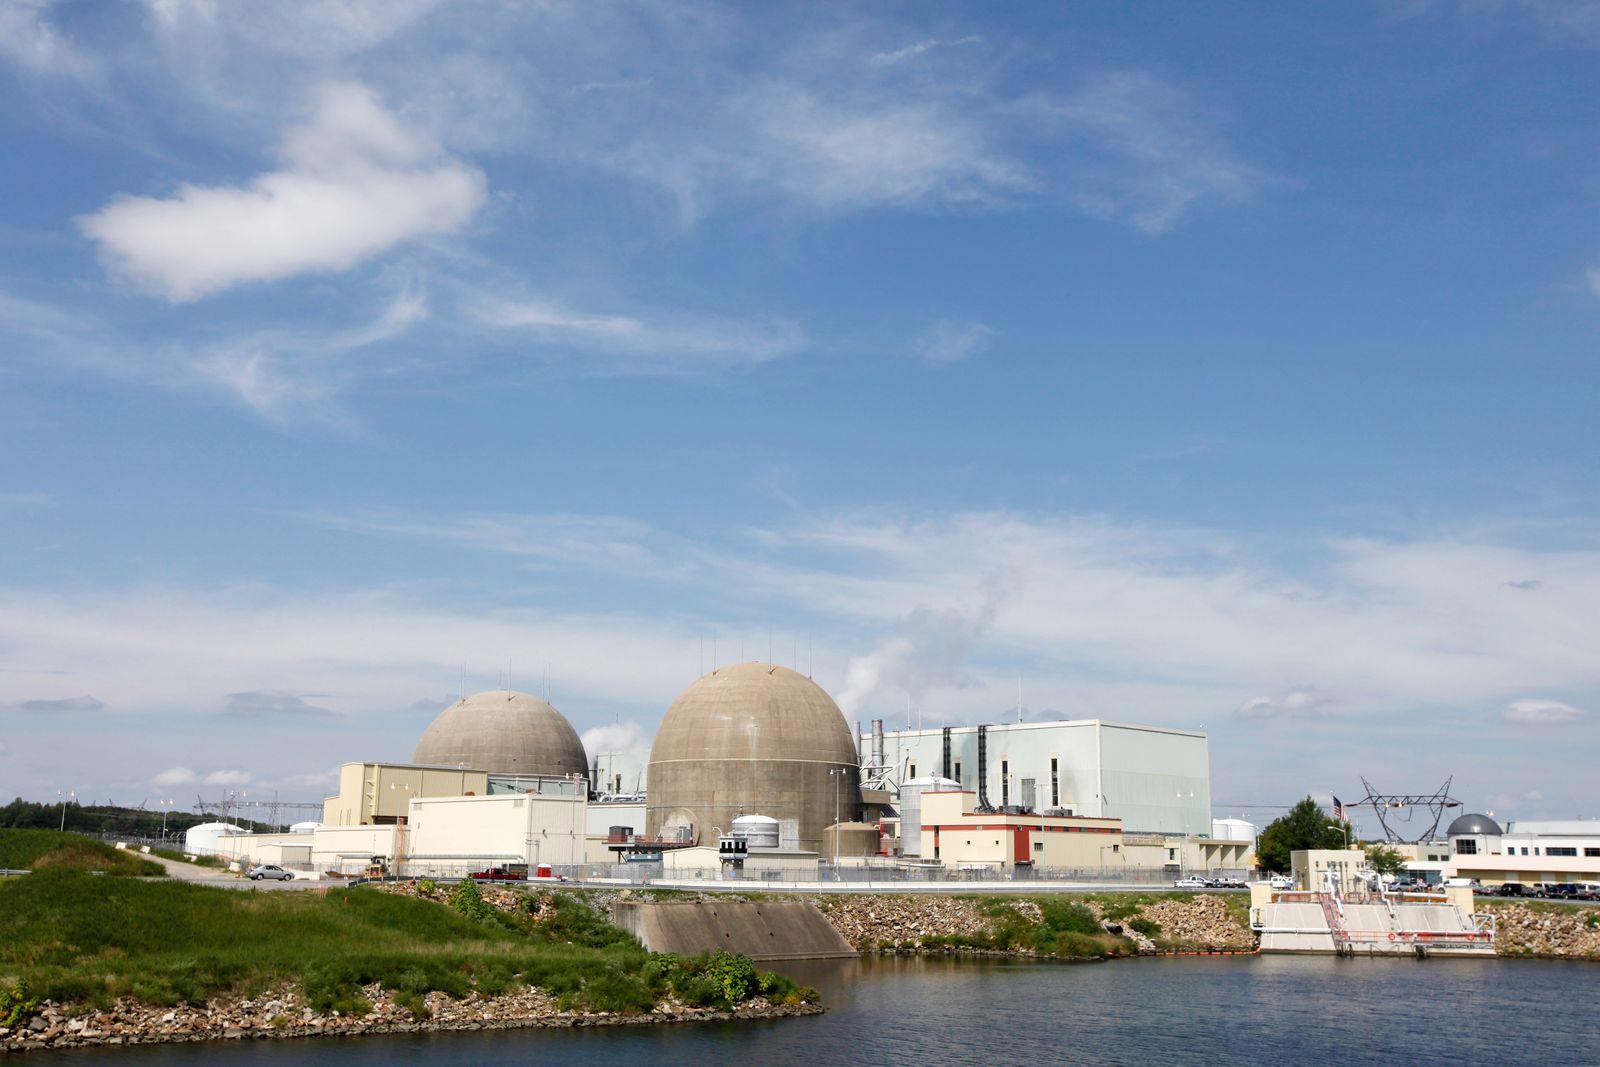 North Anna Power Station